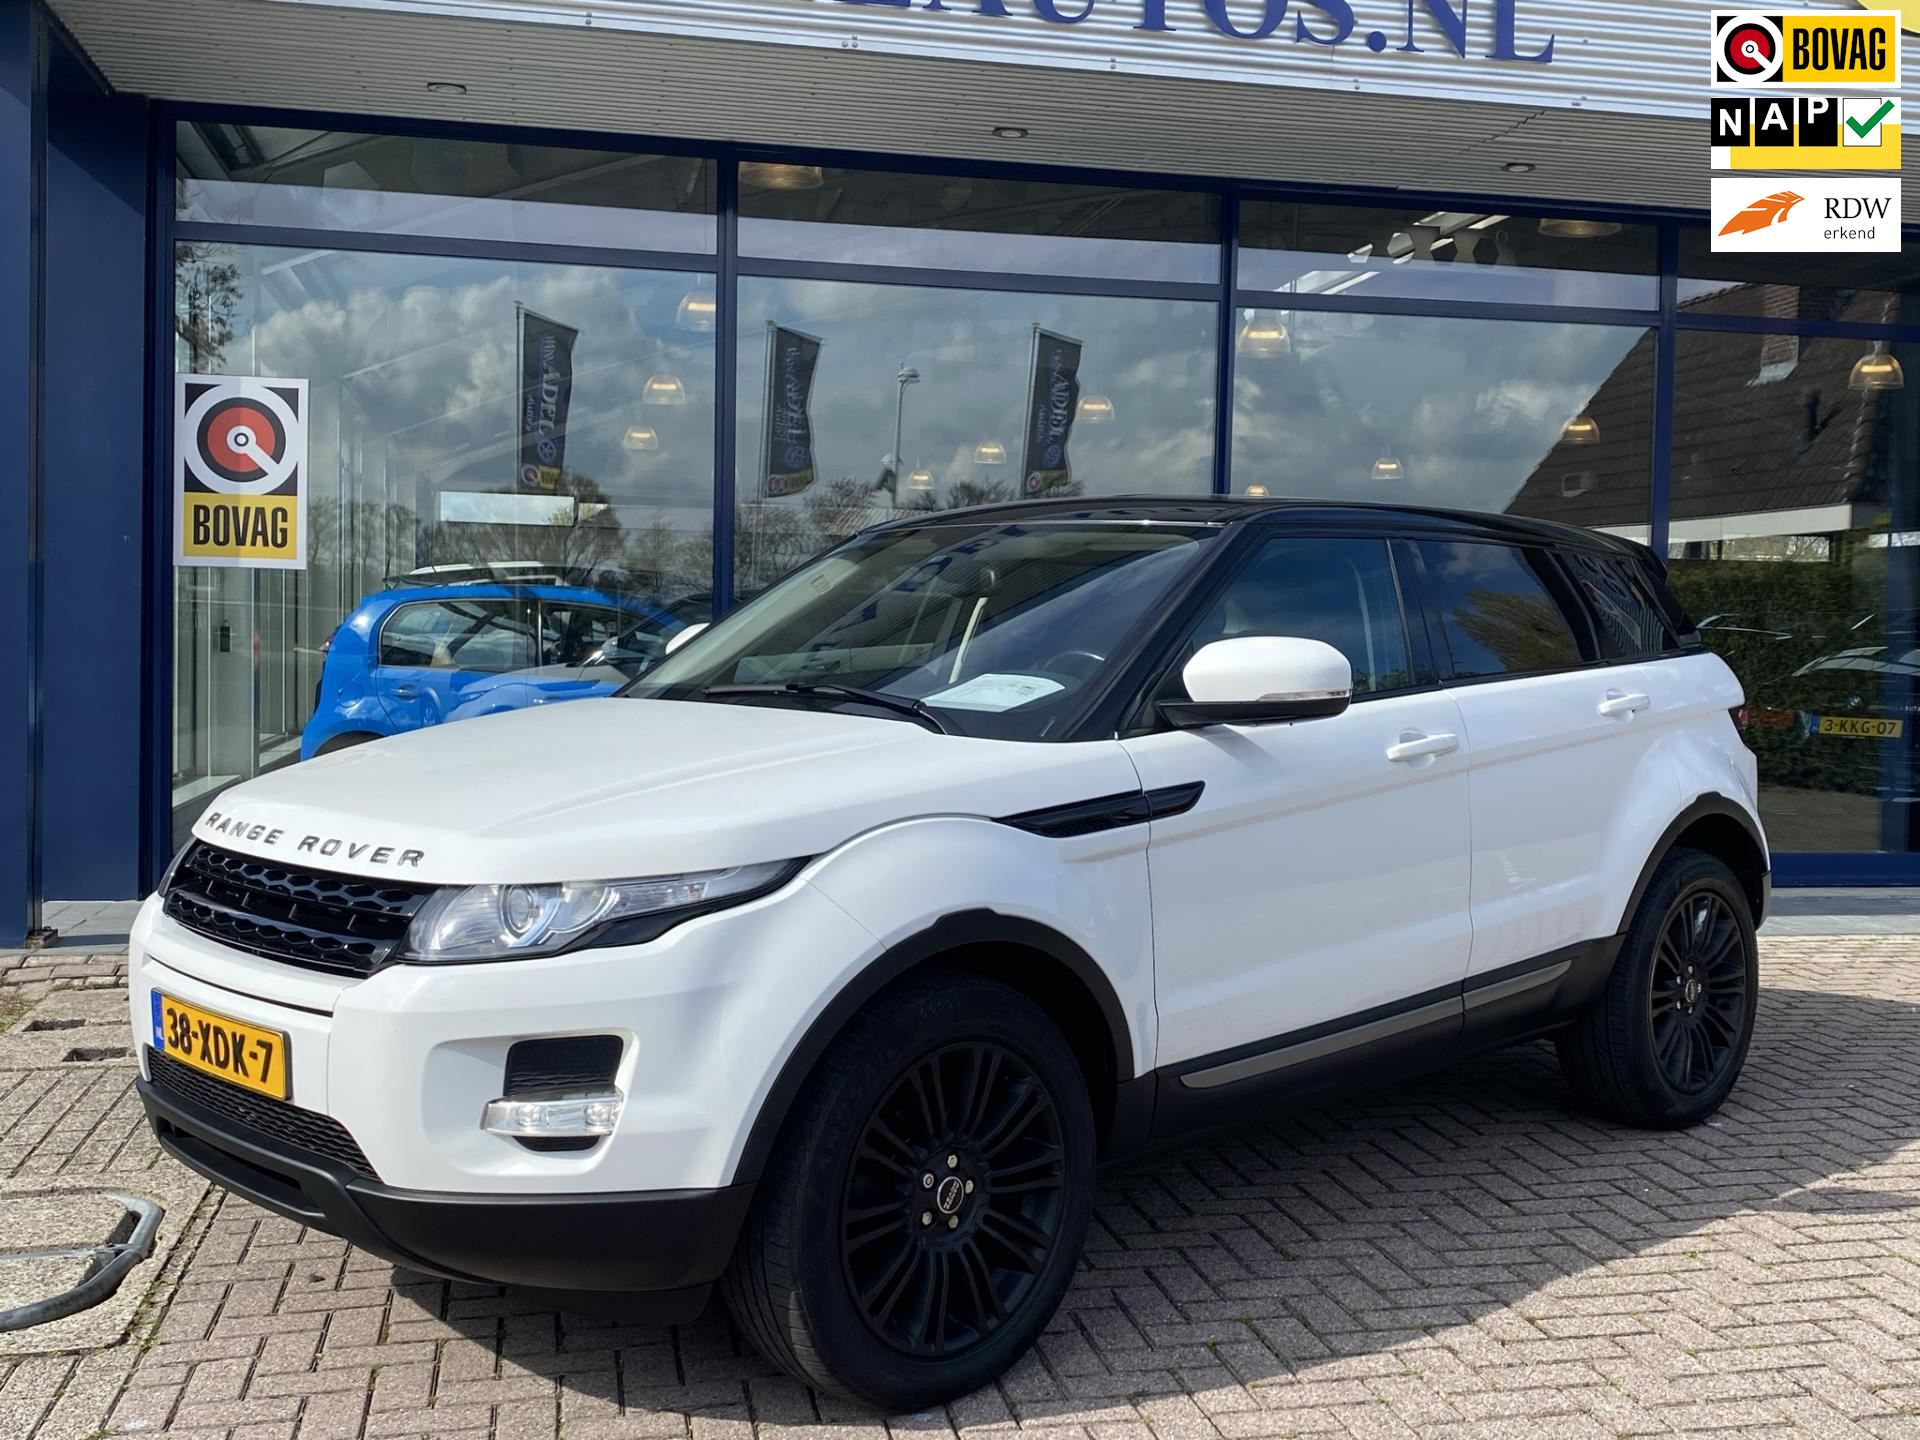 Land Rover Range Rover Evoque occasion - Van Adel Auto's